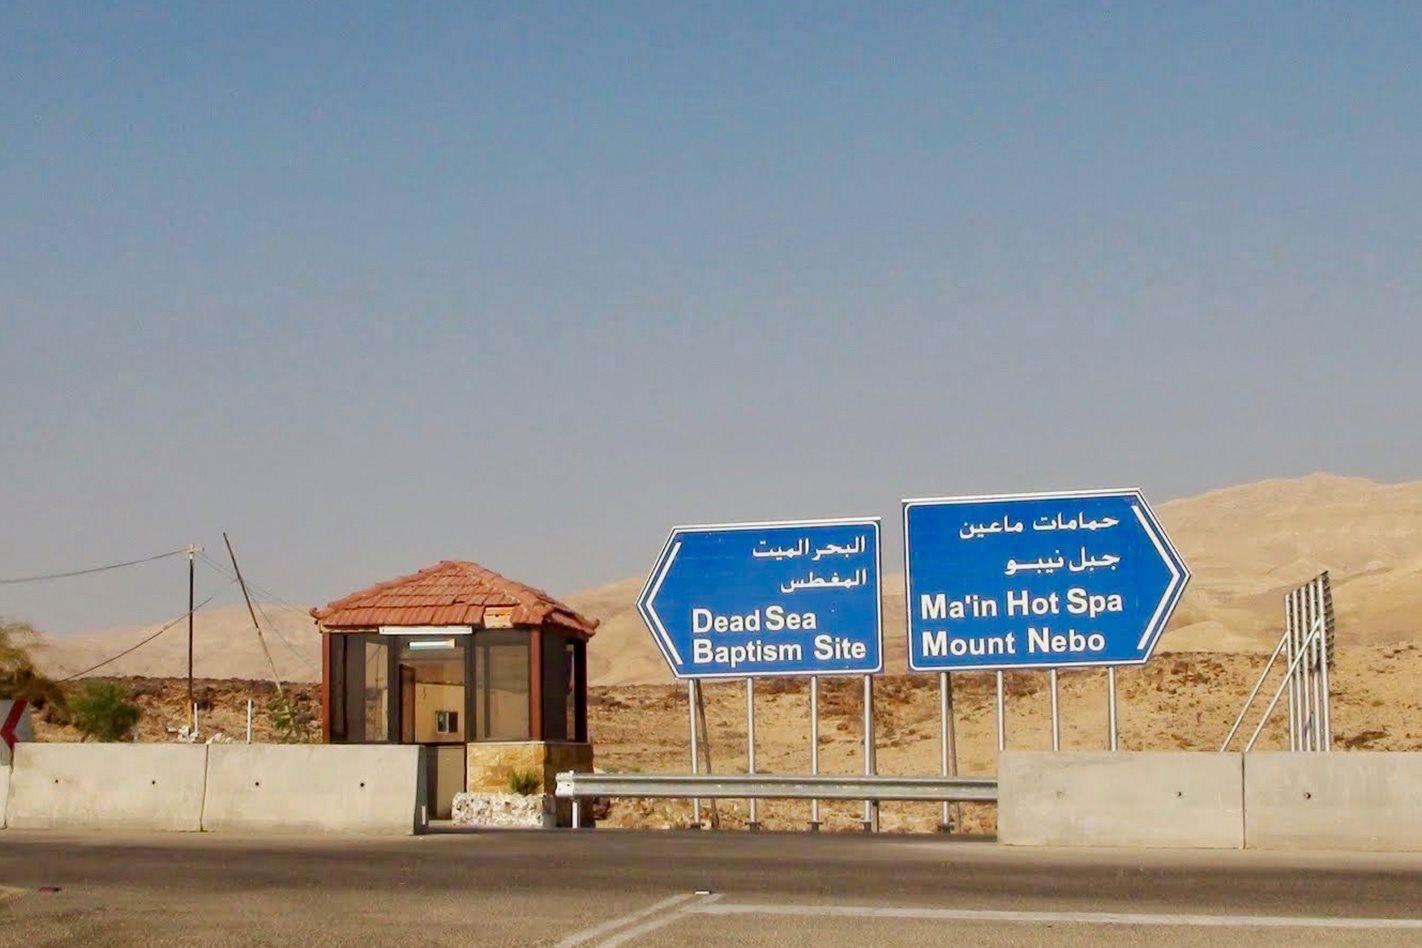 Dead-Sea-Signage,-Jordan.jpg